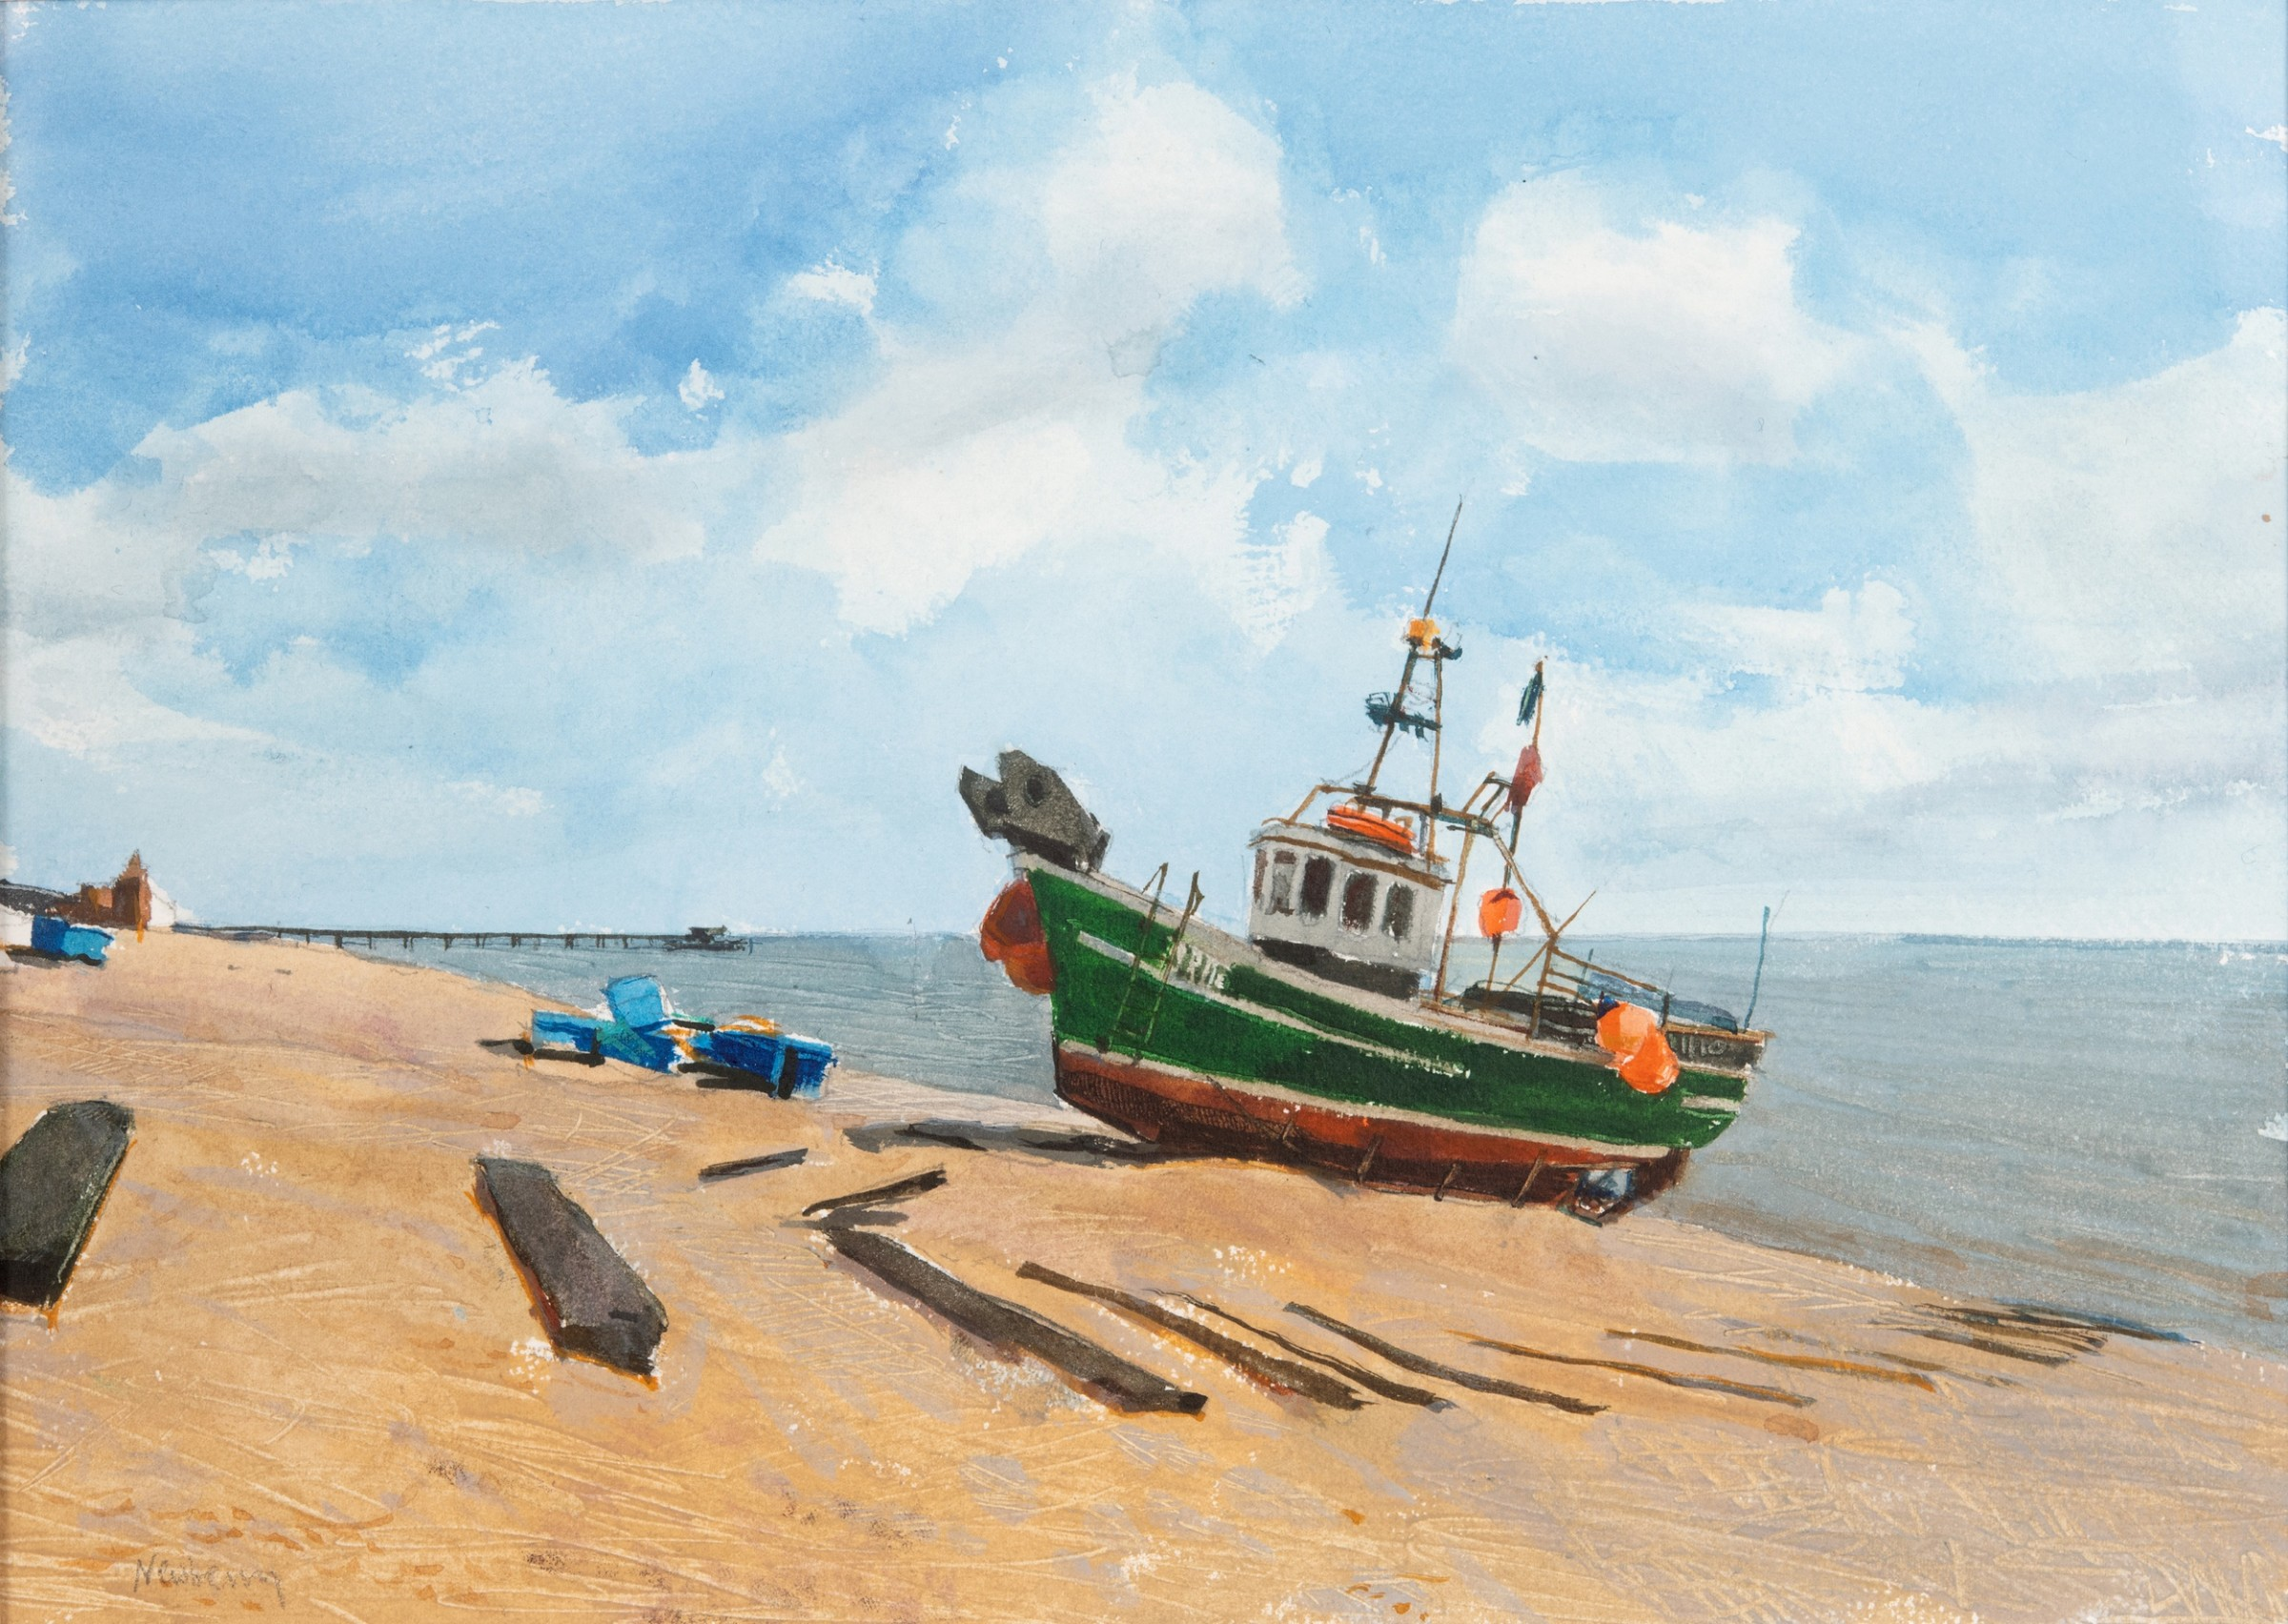 "<span class=""link fancybox-details-link""><a href=""/artists/86-john-newberry/works/12435-john-newberry-fishing-boats-walmer-beach/"">View Detail Page</a></span><div class=""artist""><span class=""artist""><strong>John Newberry</strong></span></div><div class=""title""><em>Fishing Boats, Walmer Beach</em></div><div class=""medium"">watercolour</div><div class=""dimensions"">Frame: 41 x 54 cm<br /> Artwork: 23 x 32 cm</div><div class=""price"">£540.00</div>"